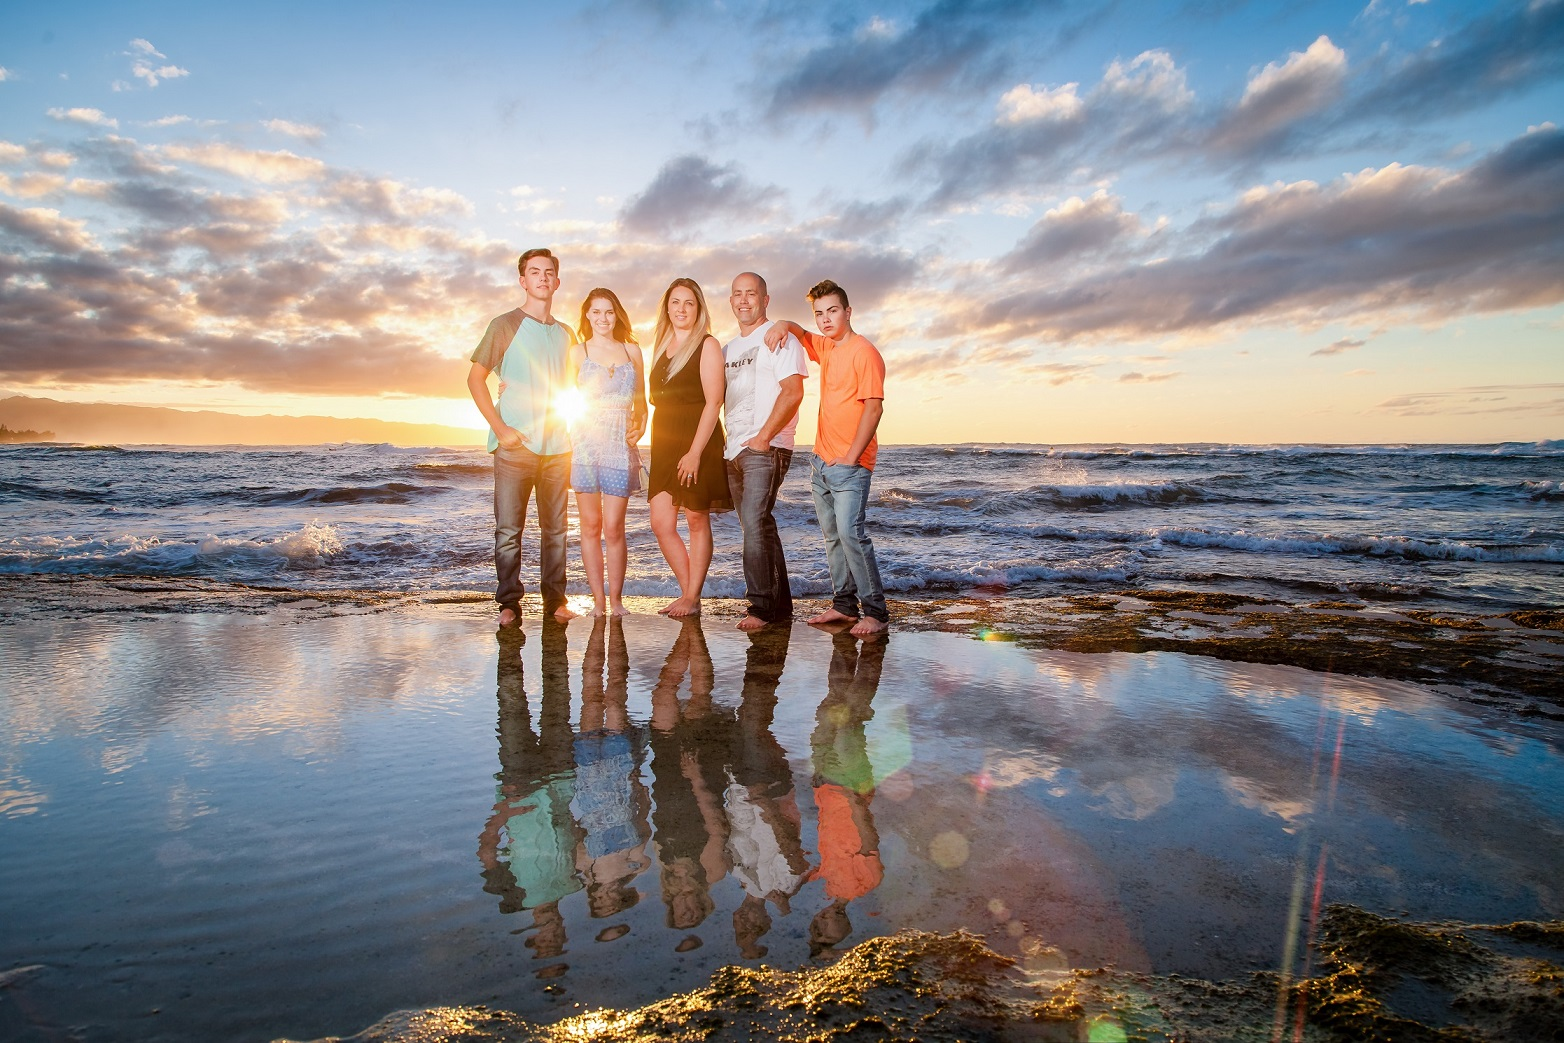 sunset beach family portrait